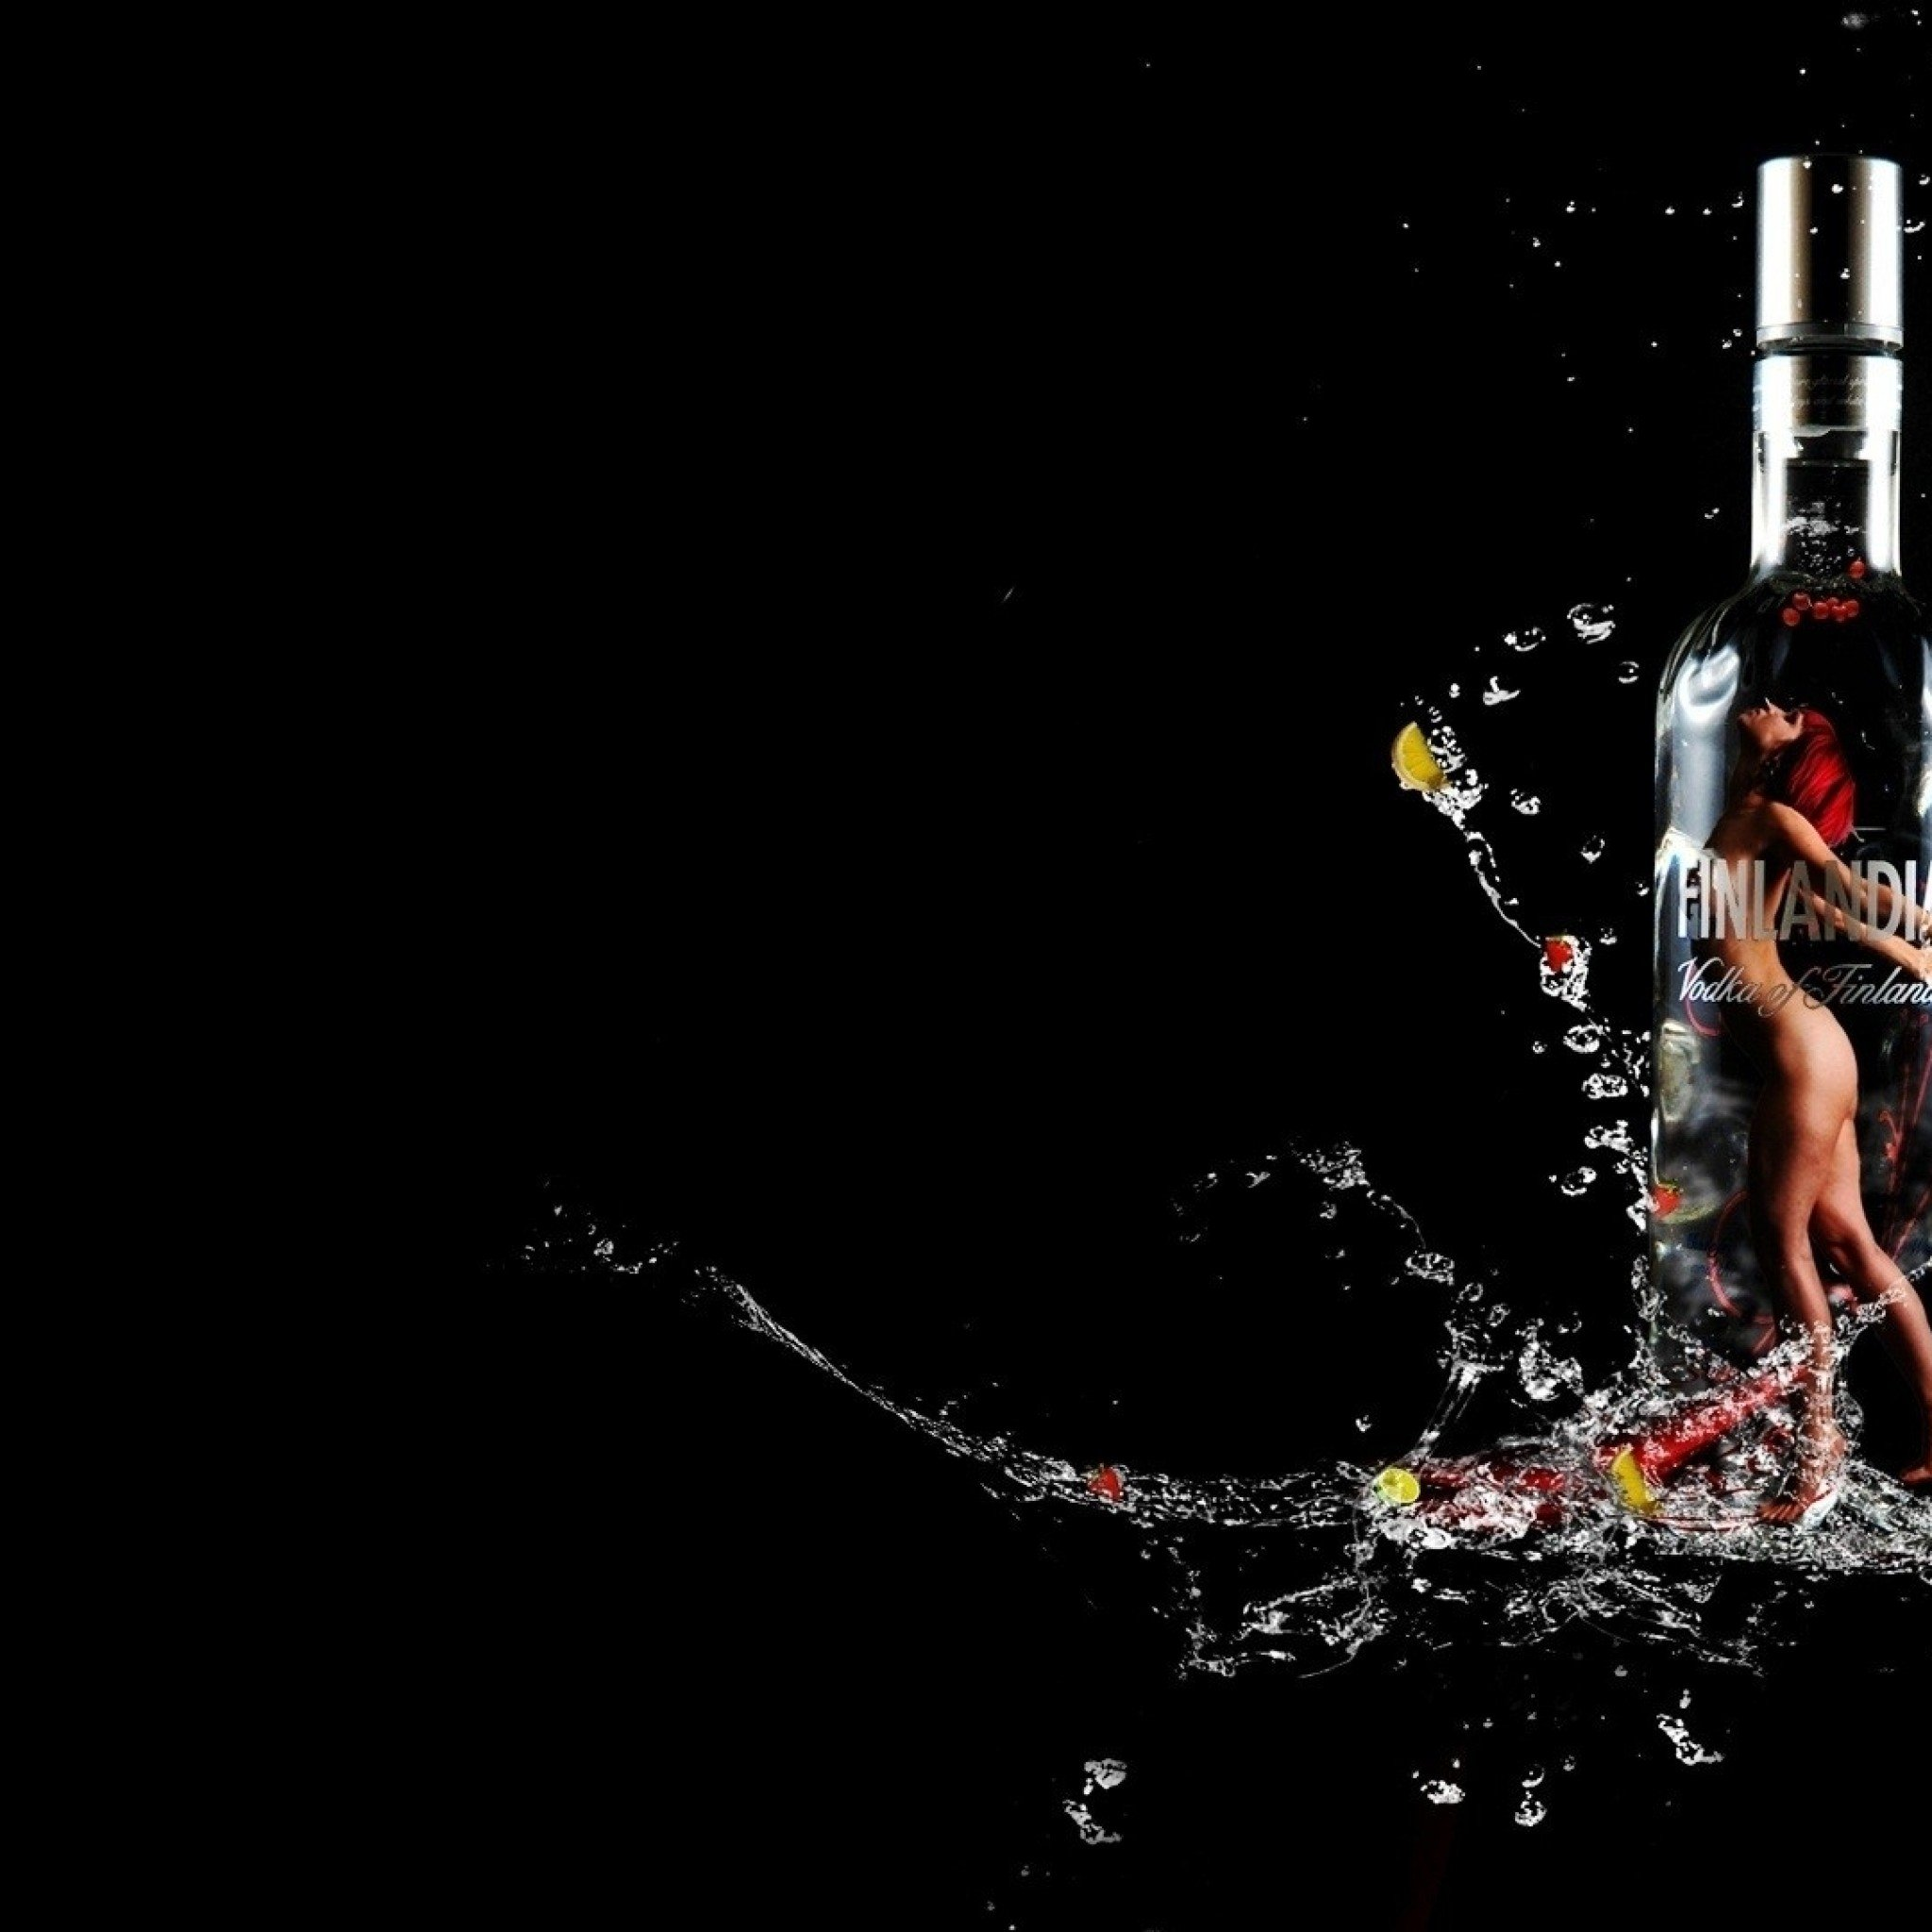 Vodka Drink Black Background 2048x2048 wallpaper 2048x2048 283037 2048x2048